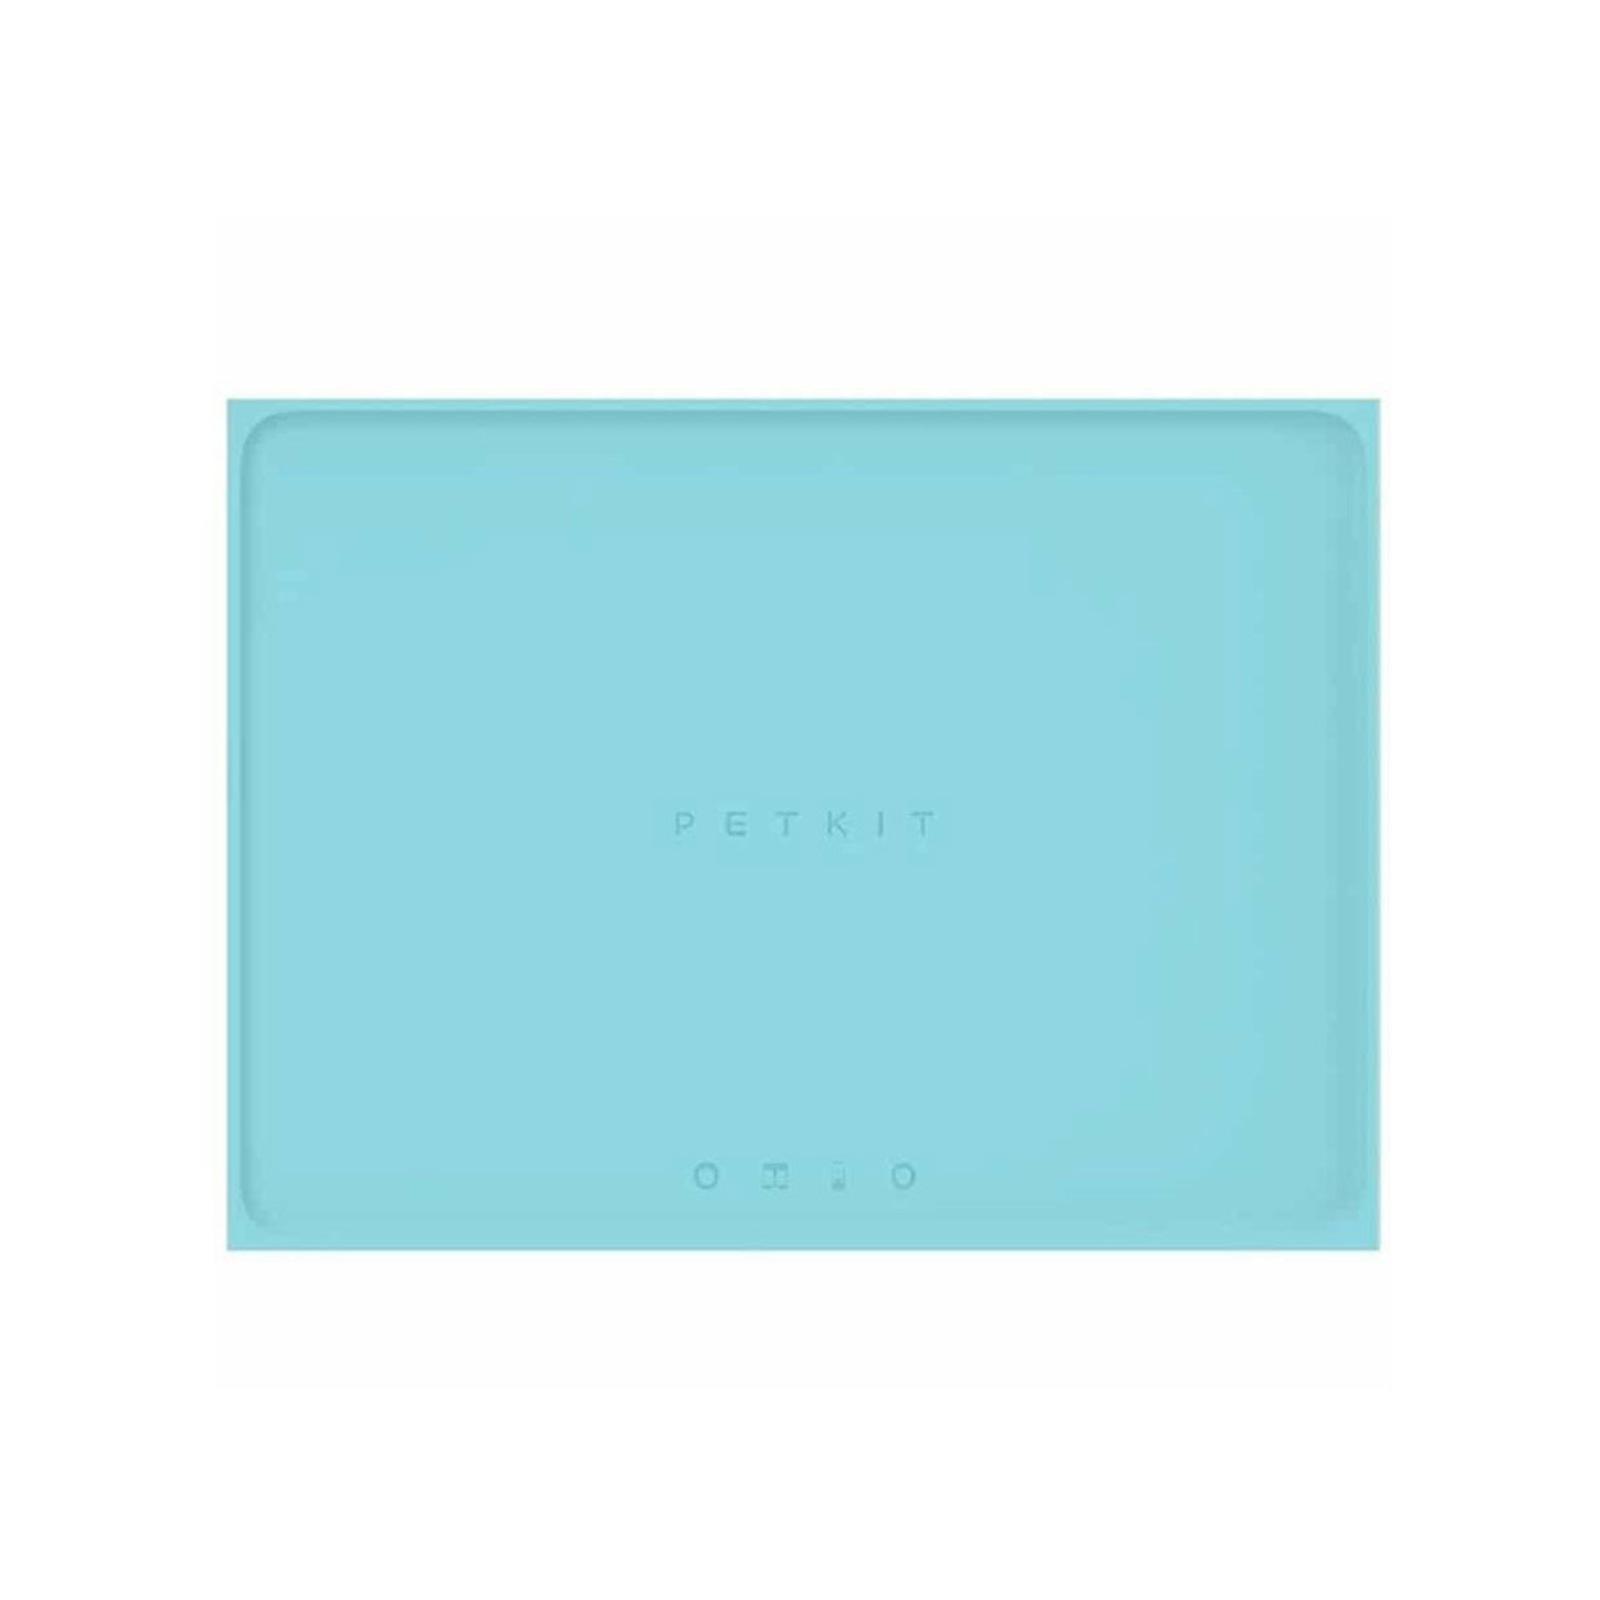 Petkit 46cm Waterproof Silicone Anti-Slip Mat for Dog/Cat Food/Water Bowl Blue